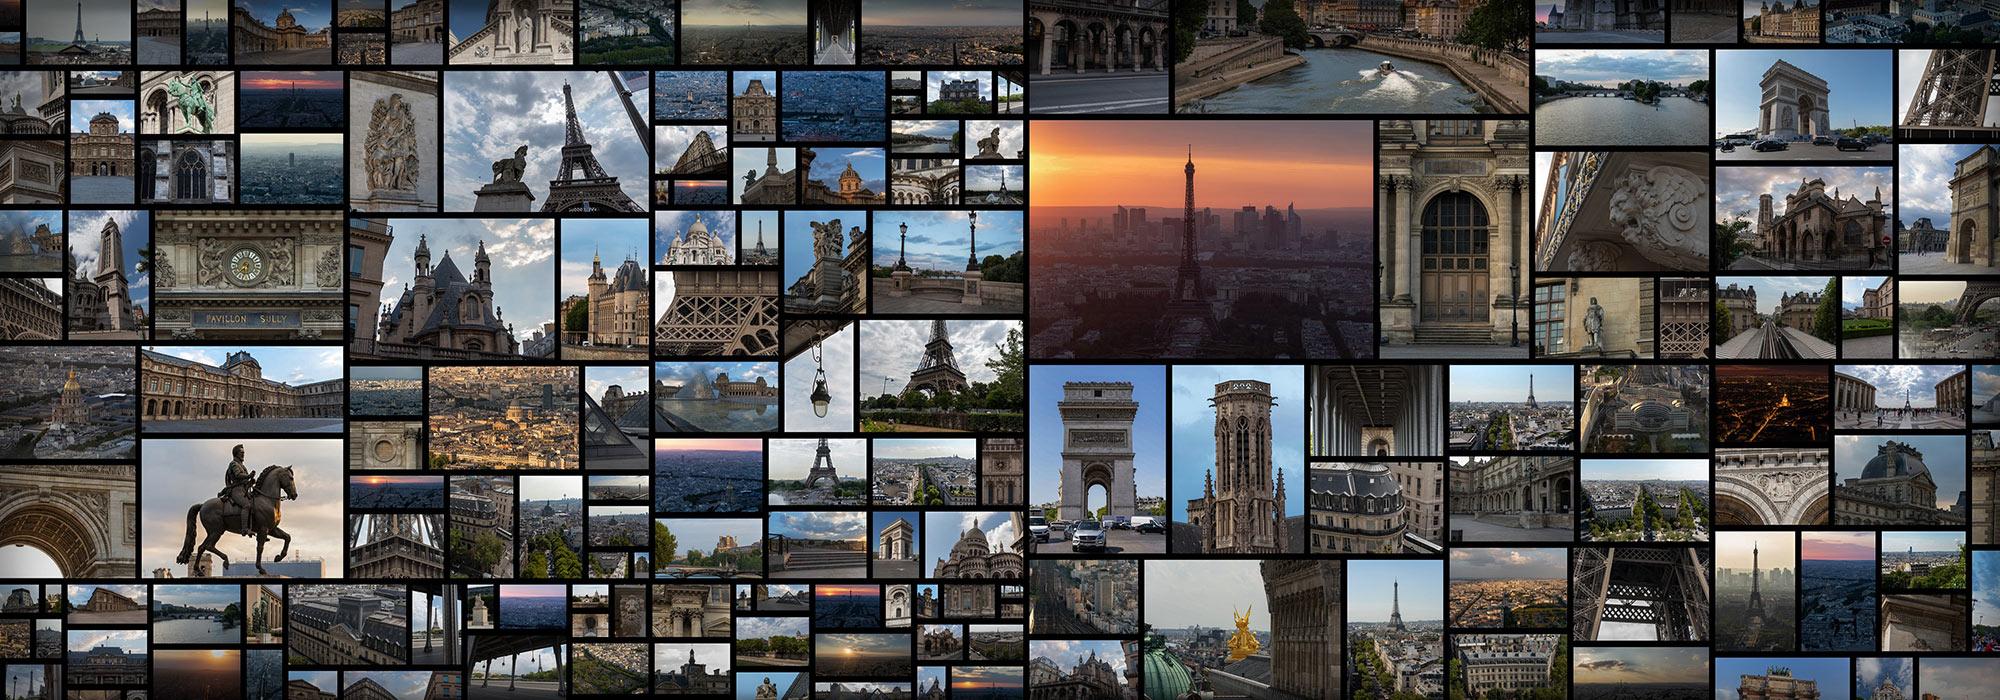 Paris City Eiffel Tower France Aerial References